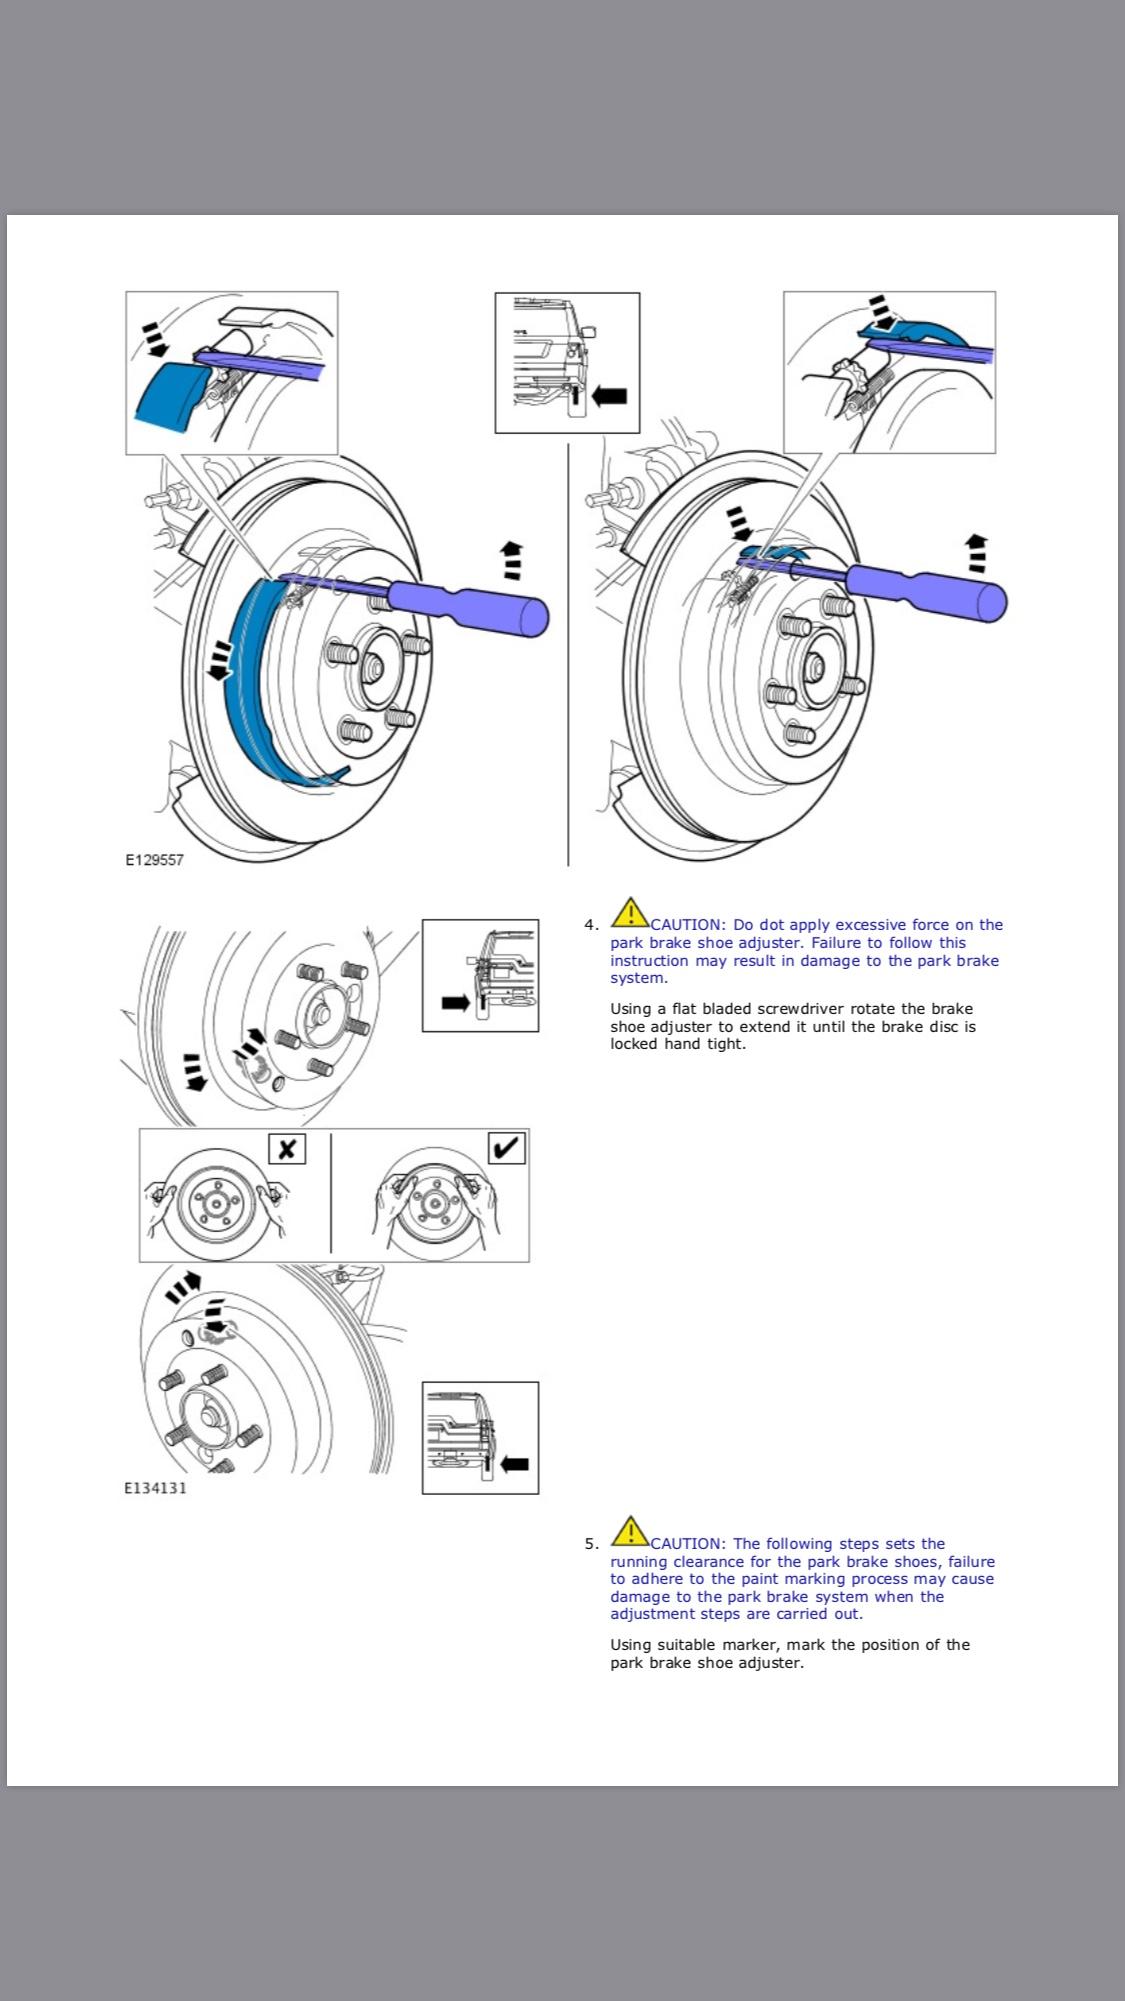 Parking Brake Service Mode And Adjustment Knurl Help